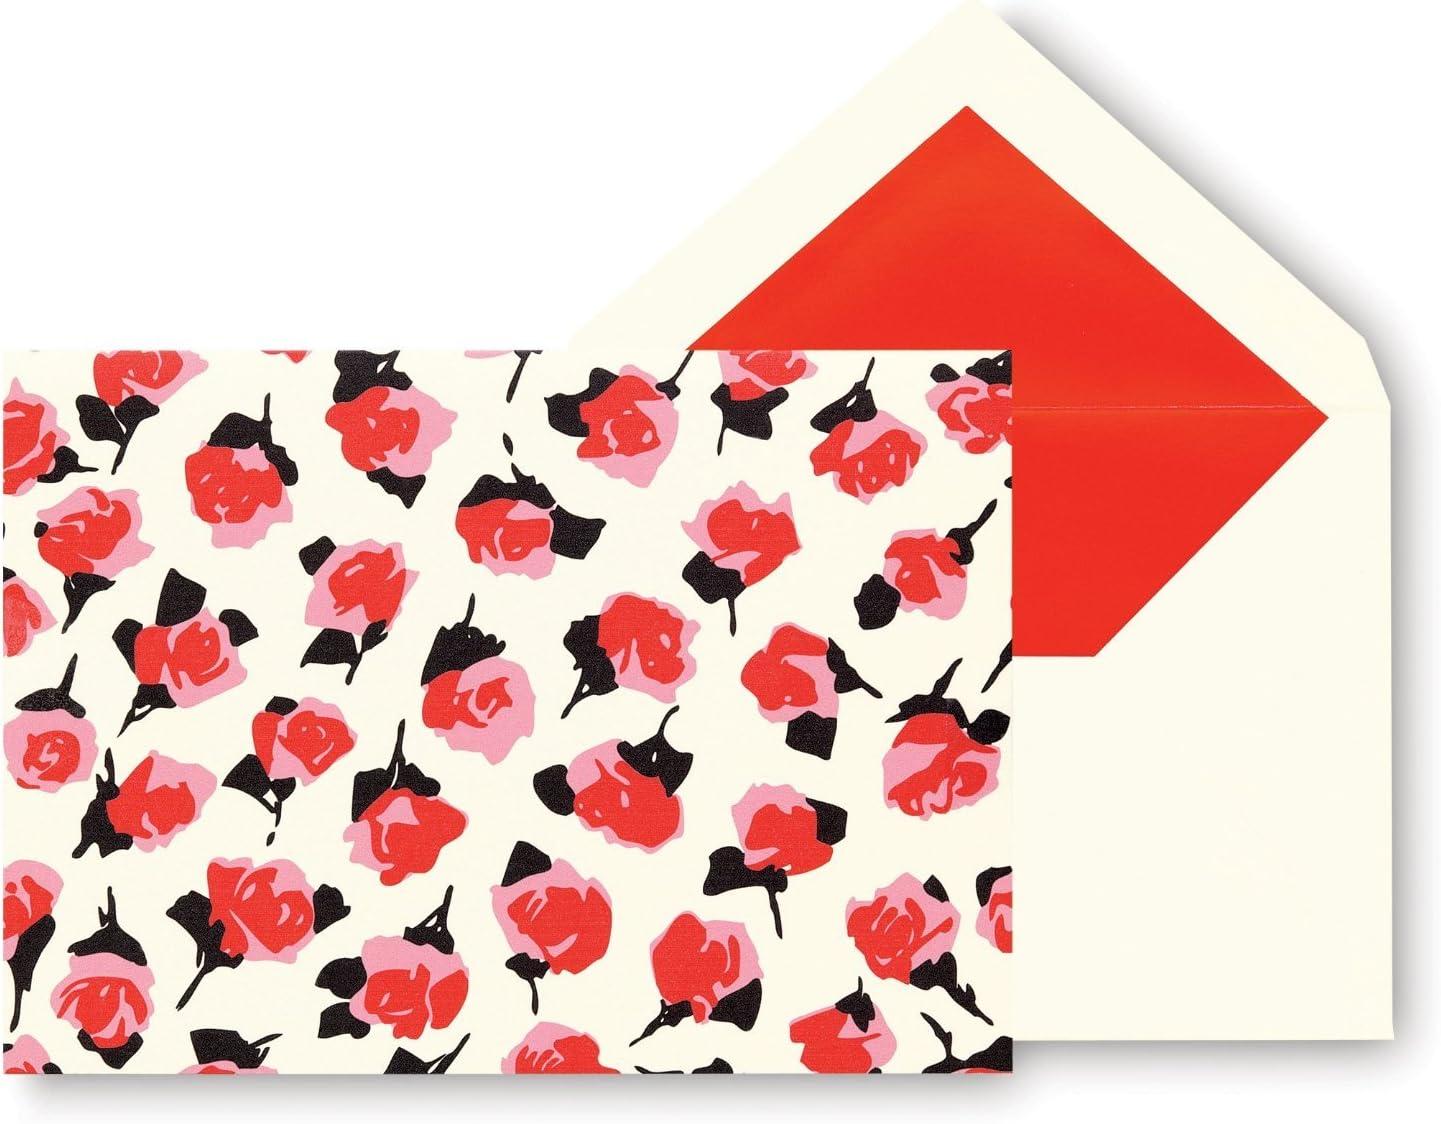 Kate Spade Note Cards Box Set 10 Blank Fashion Designer Thank You Rose Floral